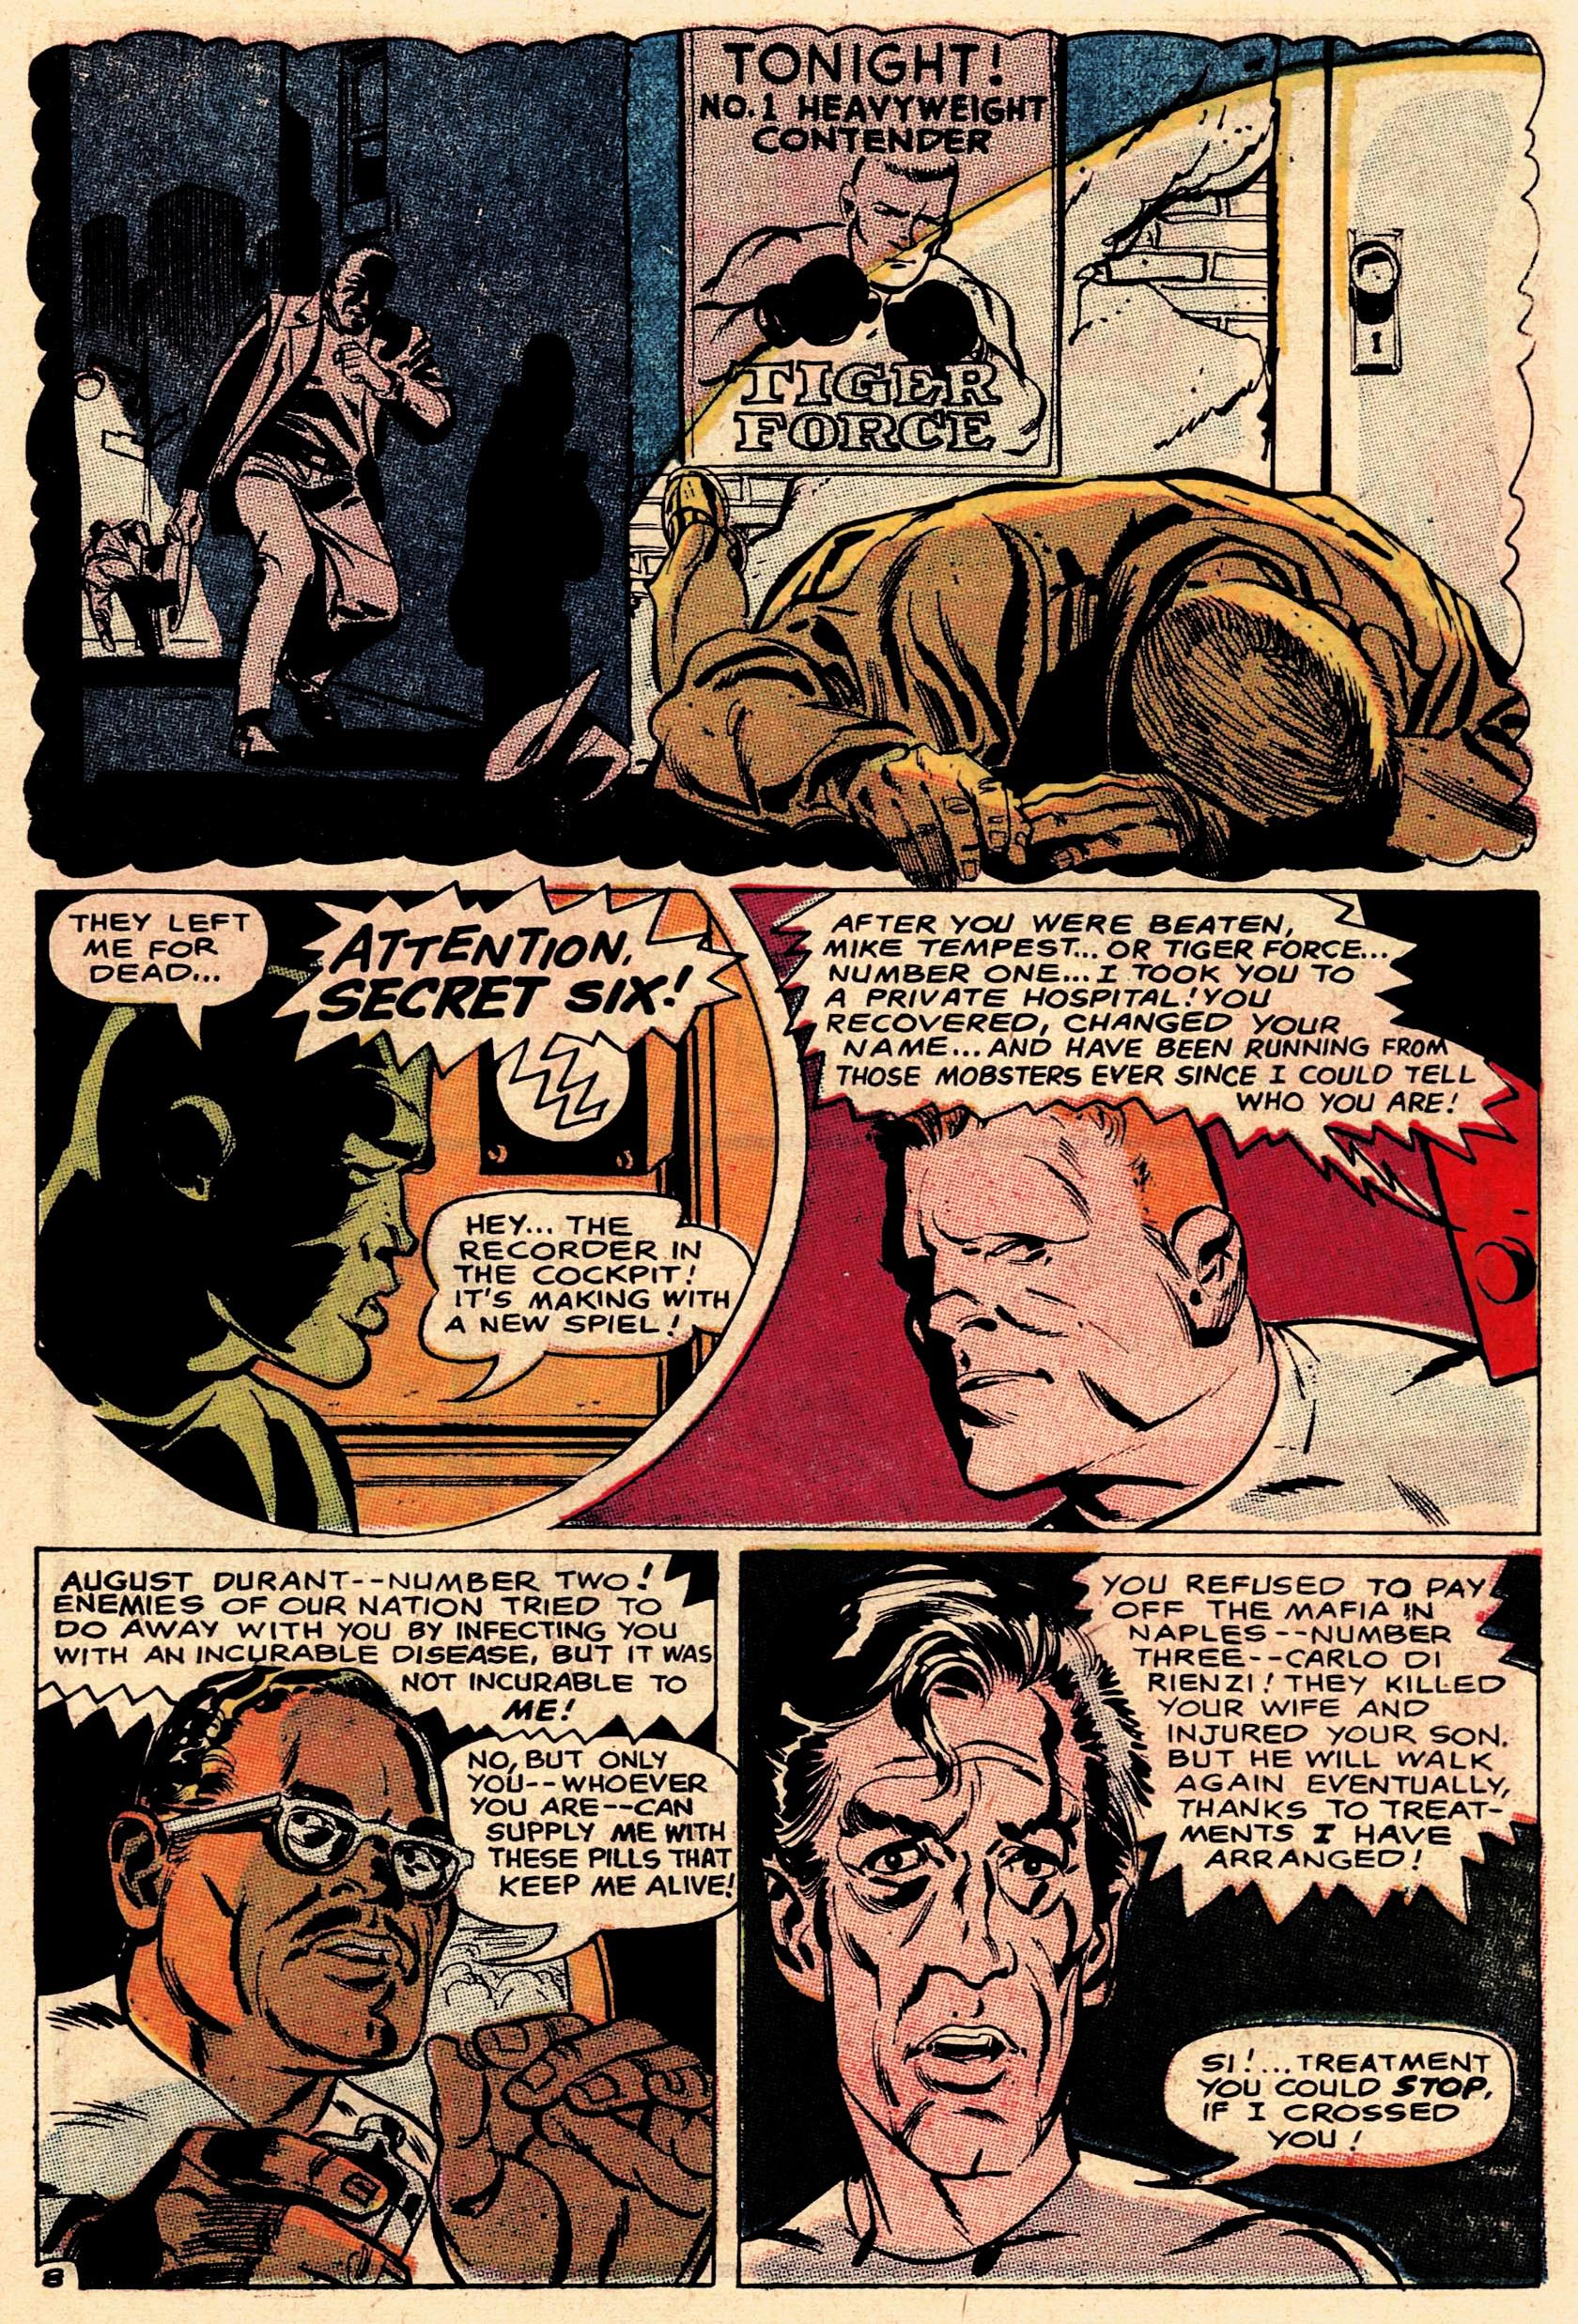 Read online Secret Six (1968) comic -  Issue #1 - 11